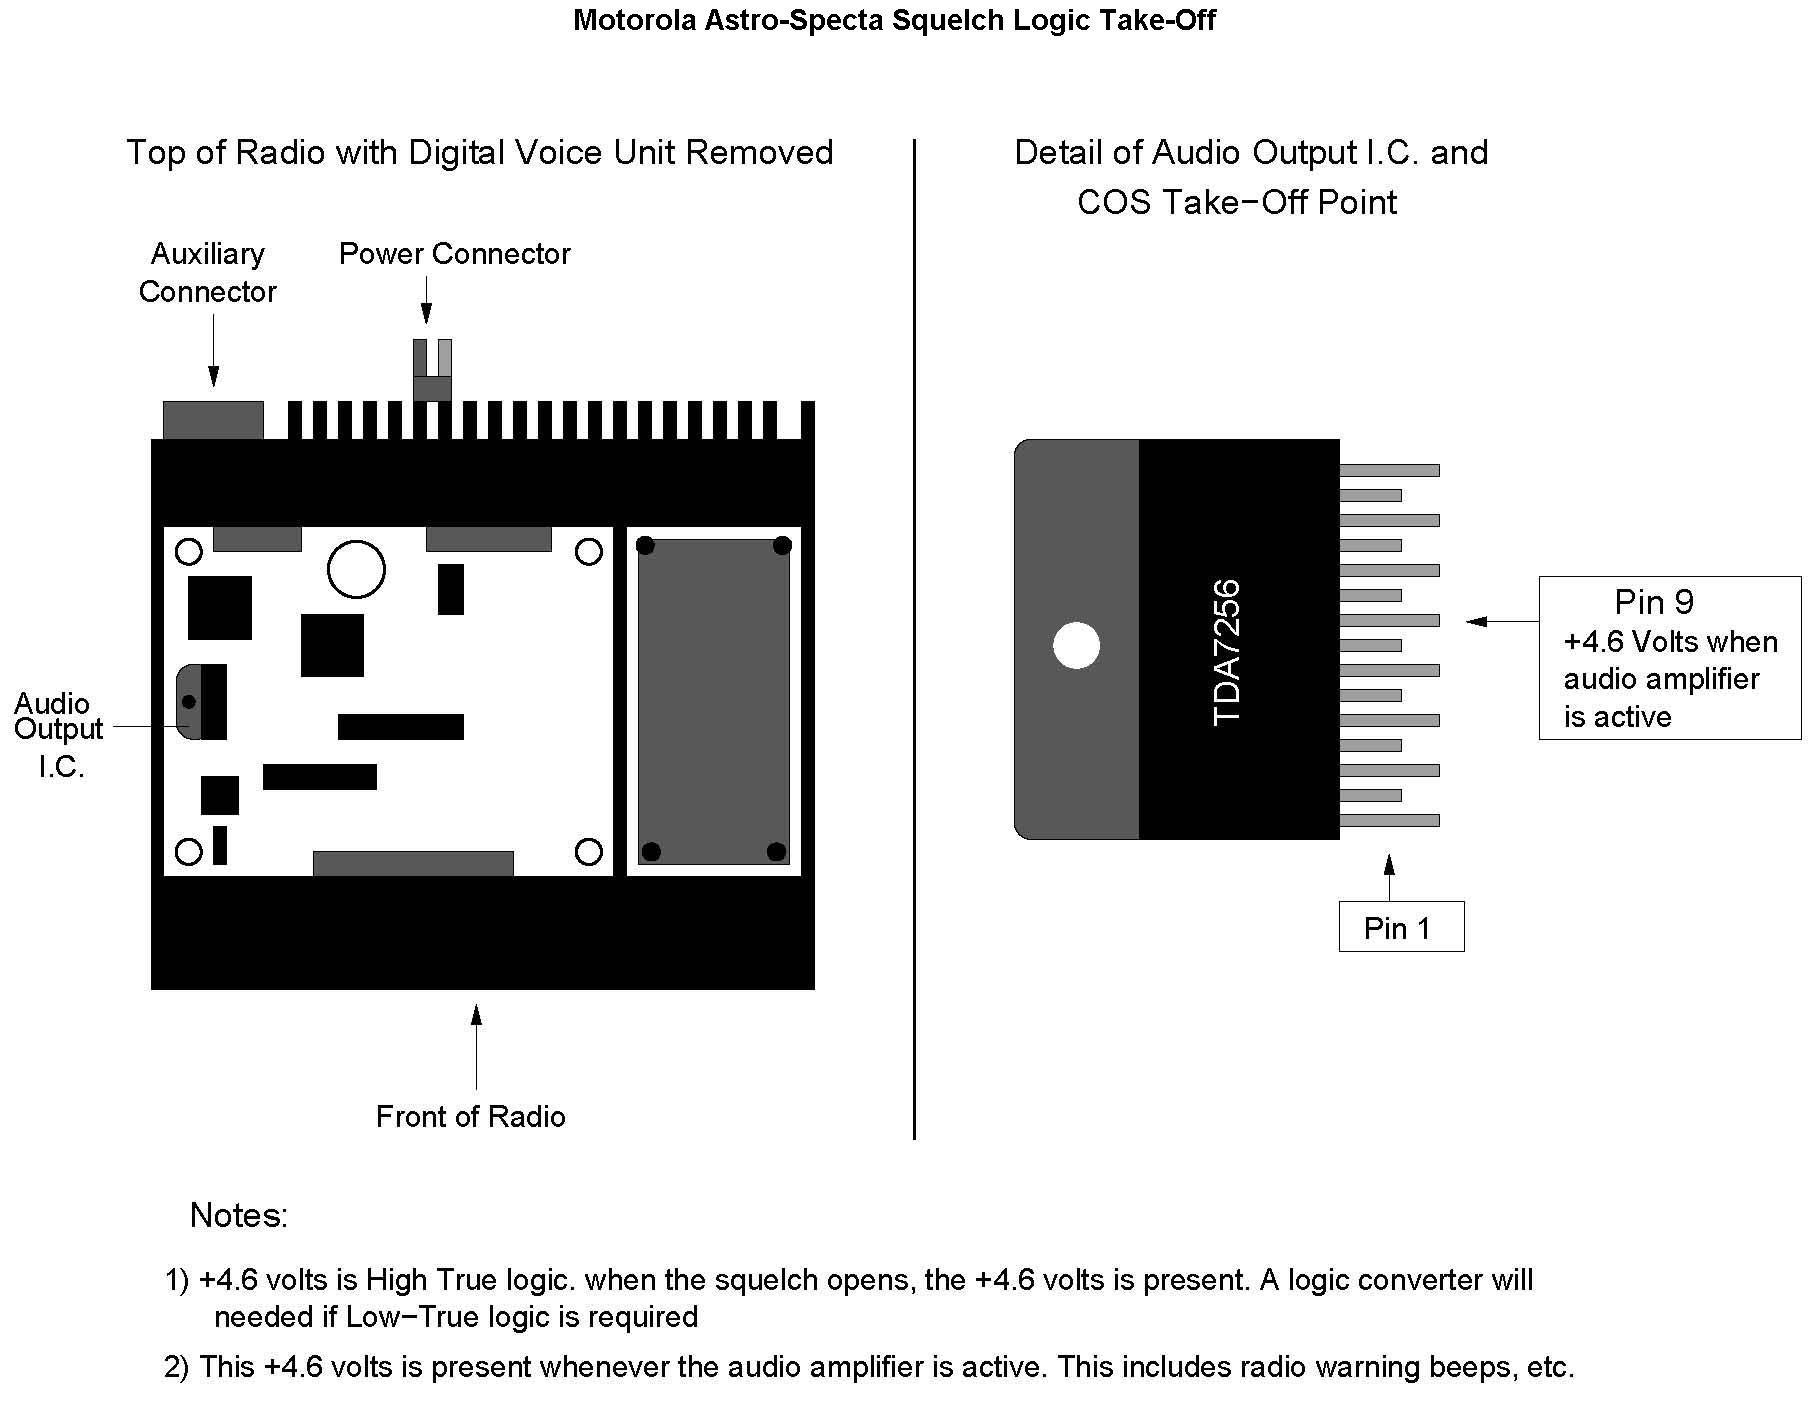 Astro Spectra COS Take Off?resize=665%2C516 motorola xtl 1500 wiring motorola tractor engine and wiring diagram motorola xtl 1500 wiring diagram at gsmx.co